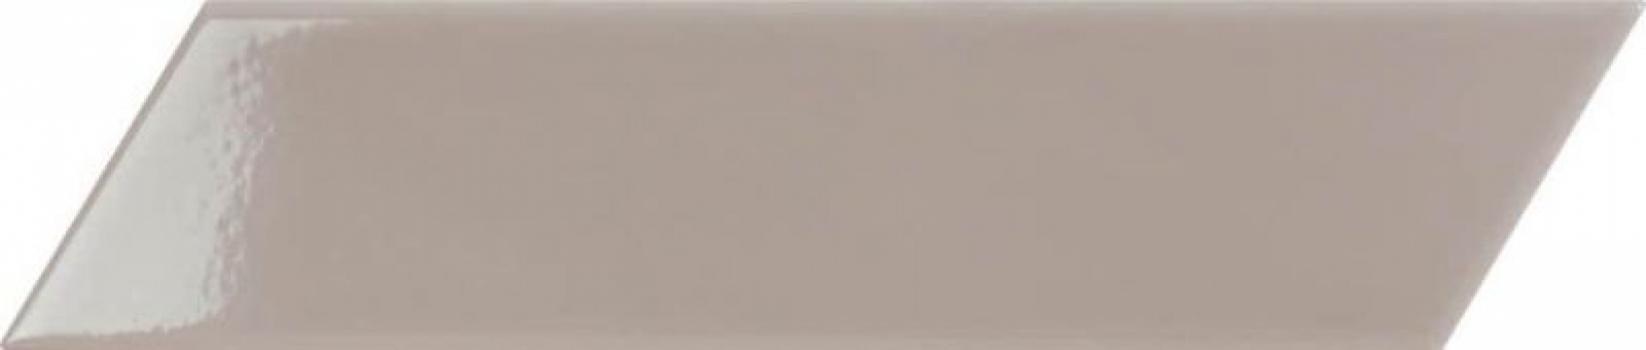 плитка настенная chevron grey left 6,4x26 см CEVICA Grey Left